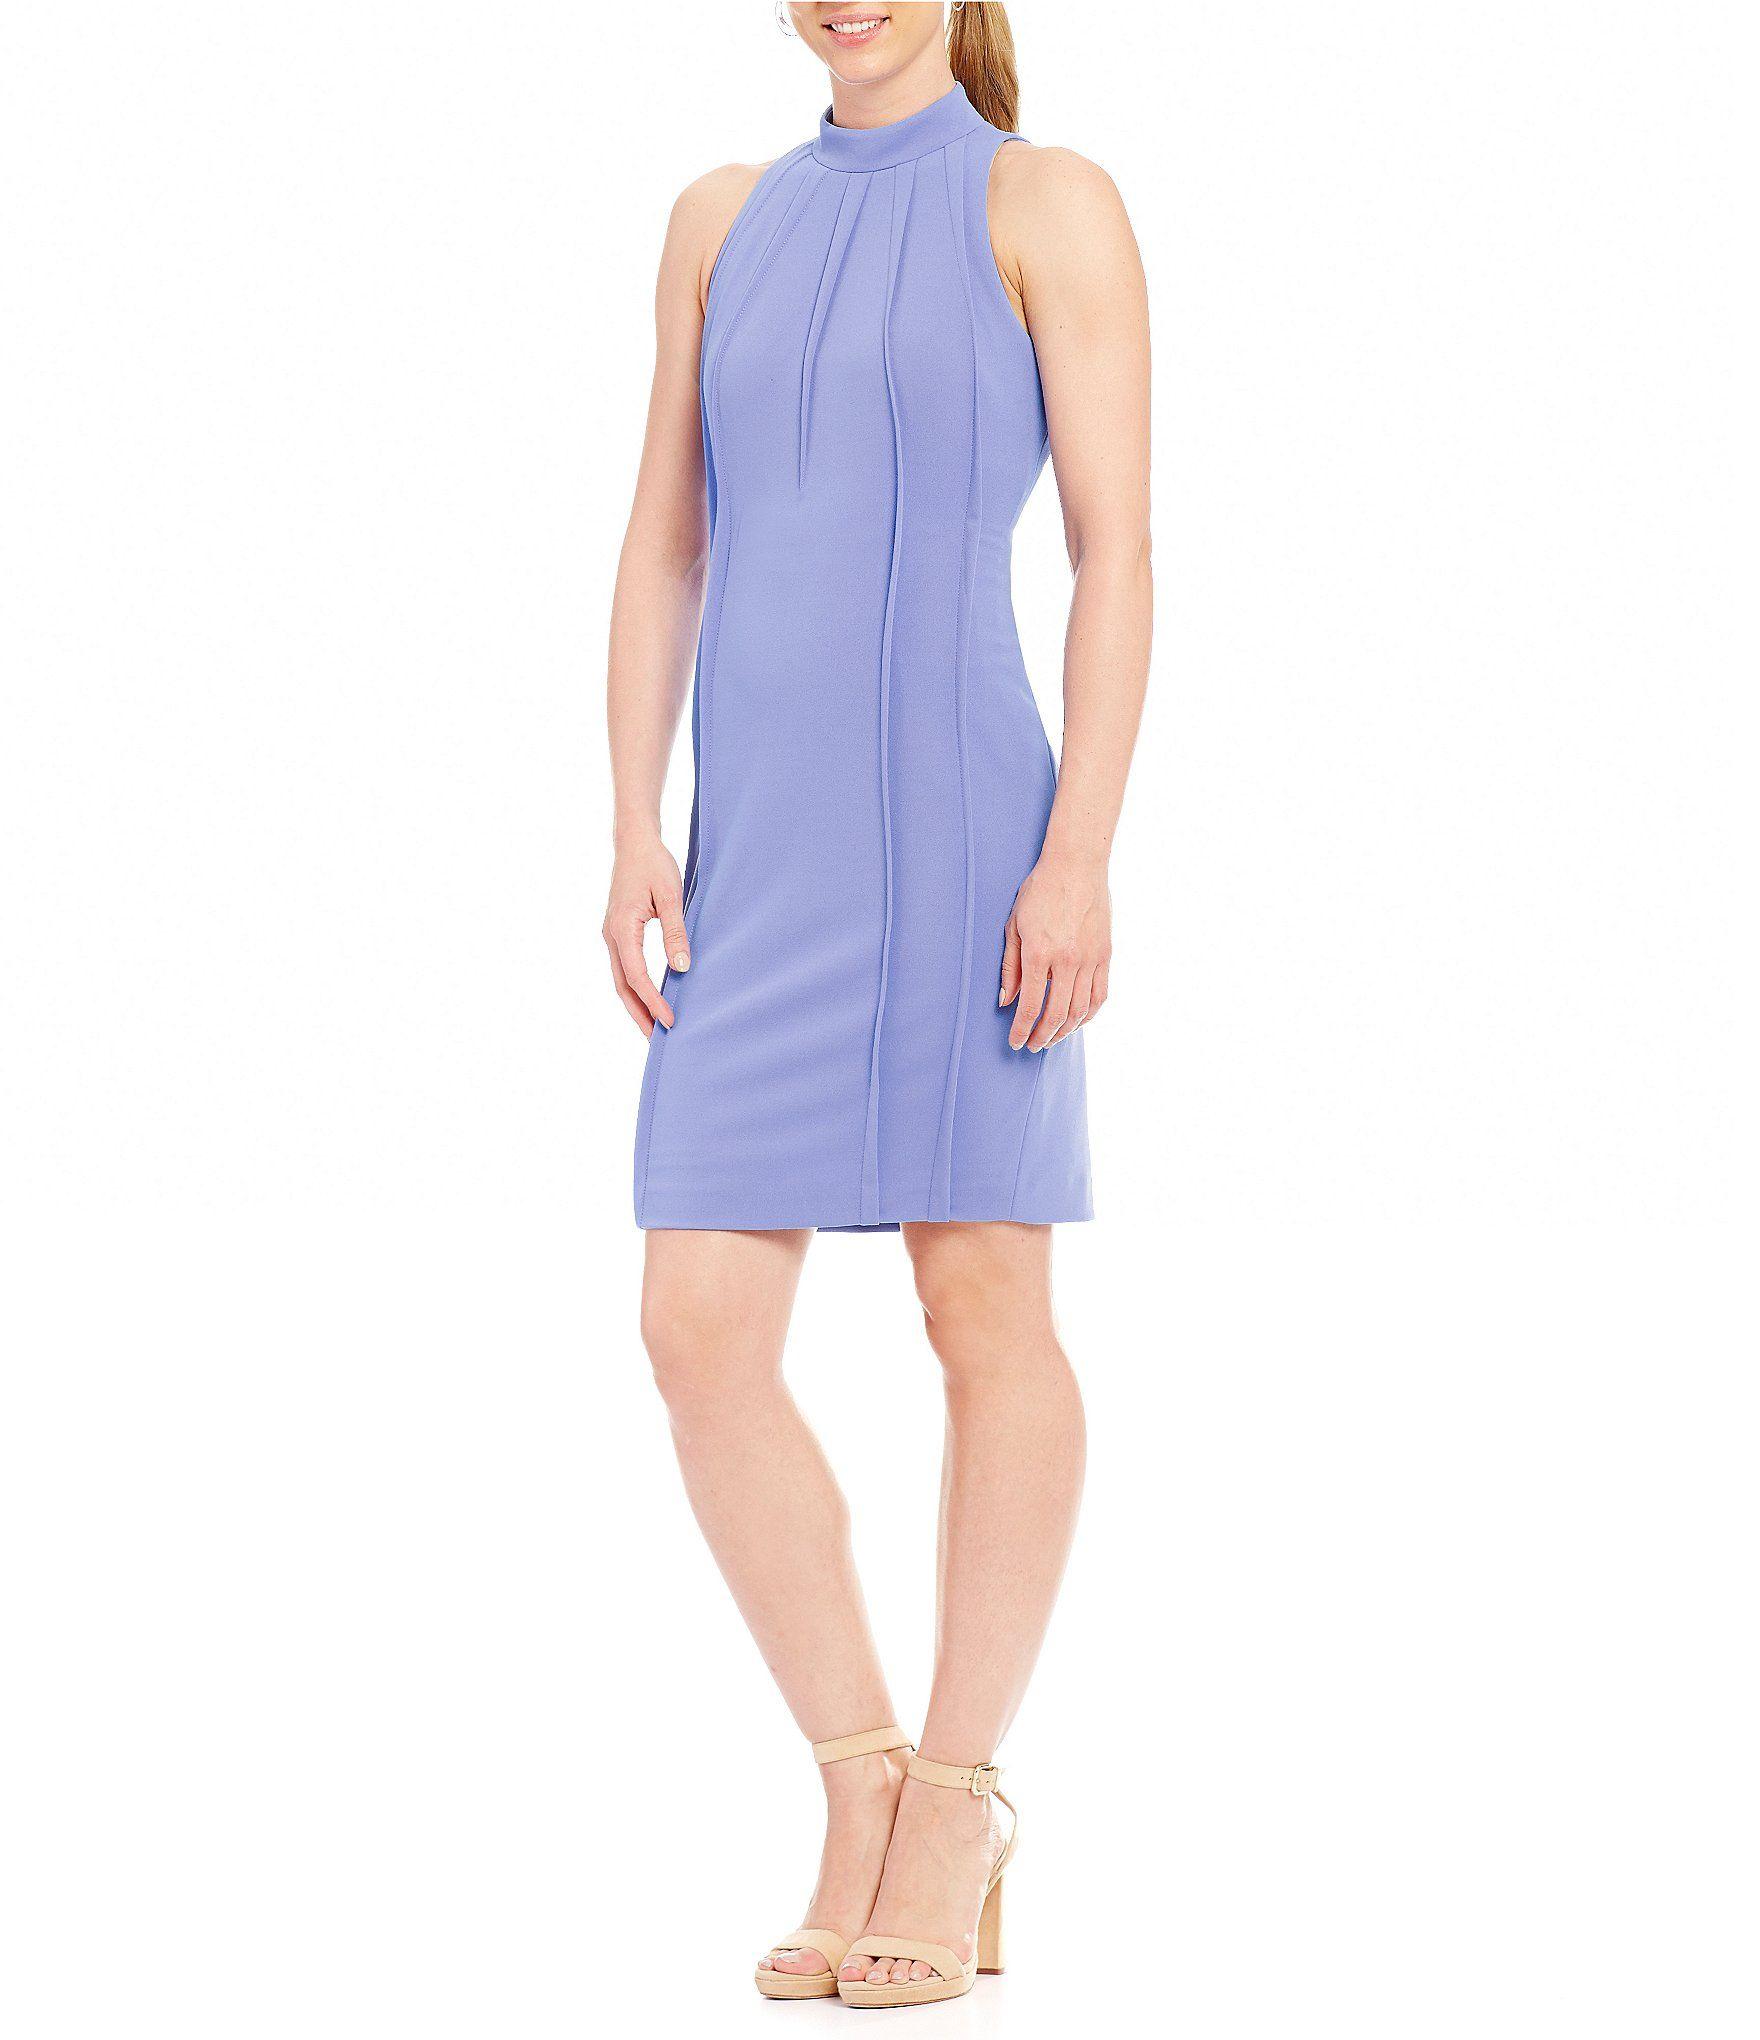 44bf4d0bf9d Shop for Antonio Melani Dilan Crepe Sheath Dress at Dillards.com. Visit  Dillards.com to find clothing